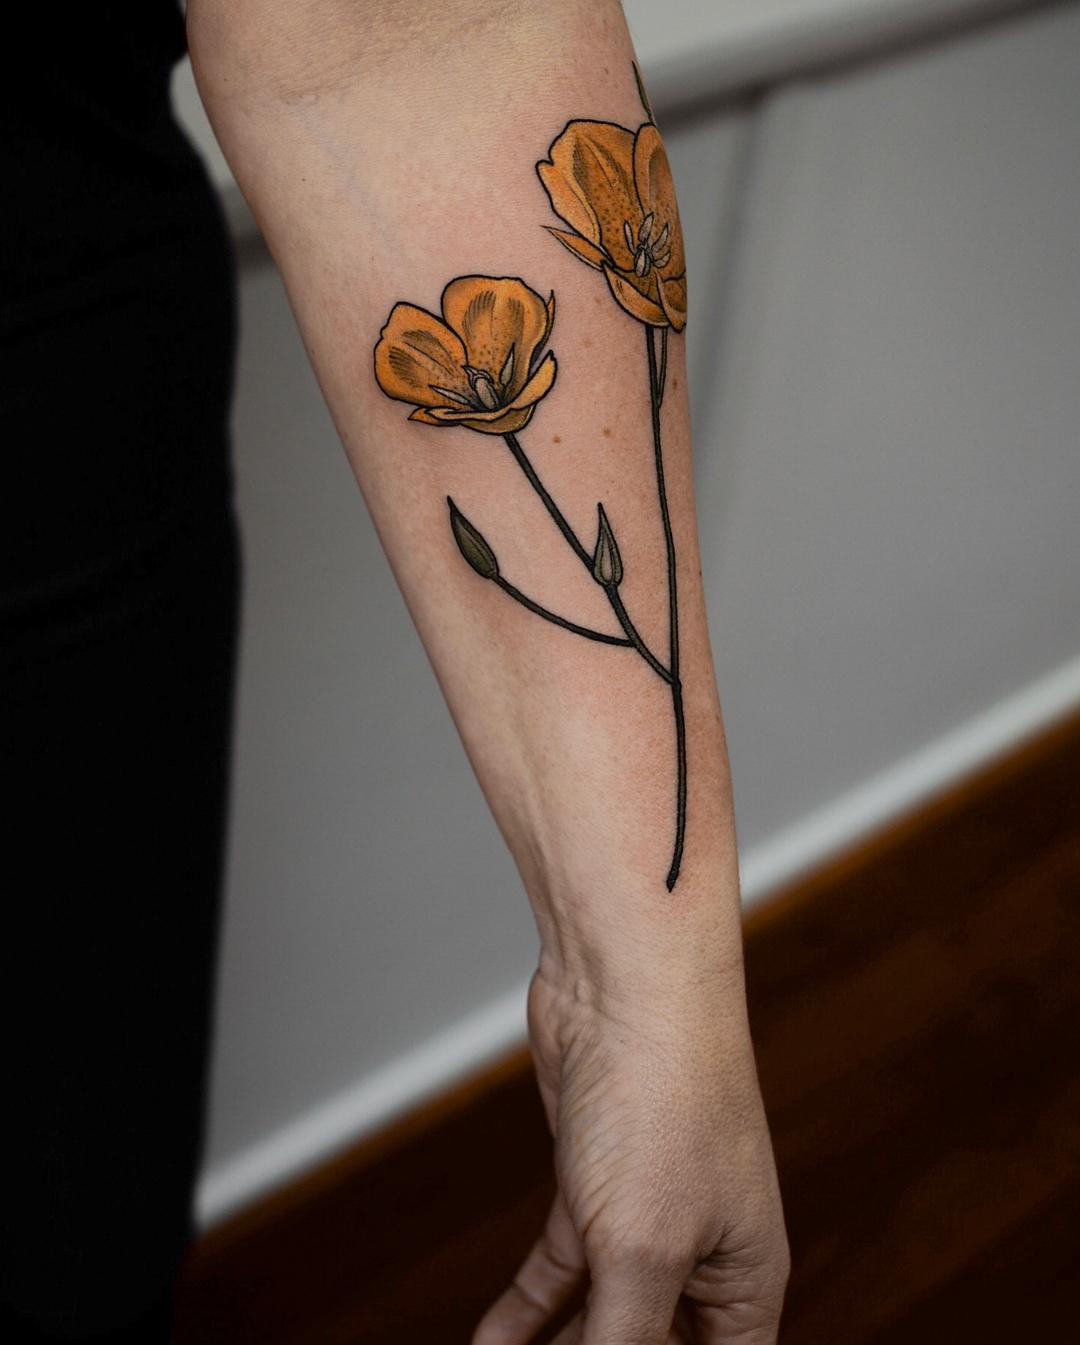 Calochortus tattoo by @sophiabaughan